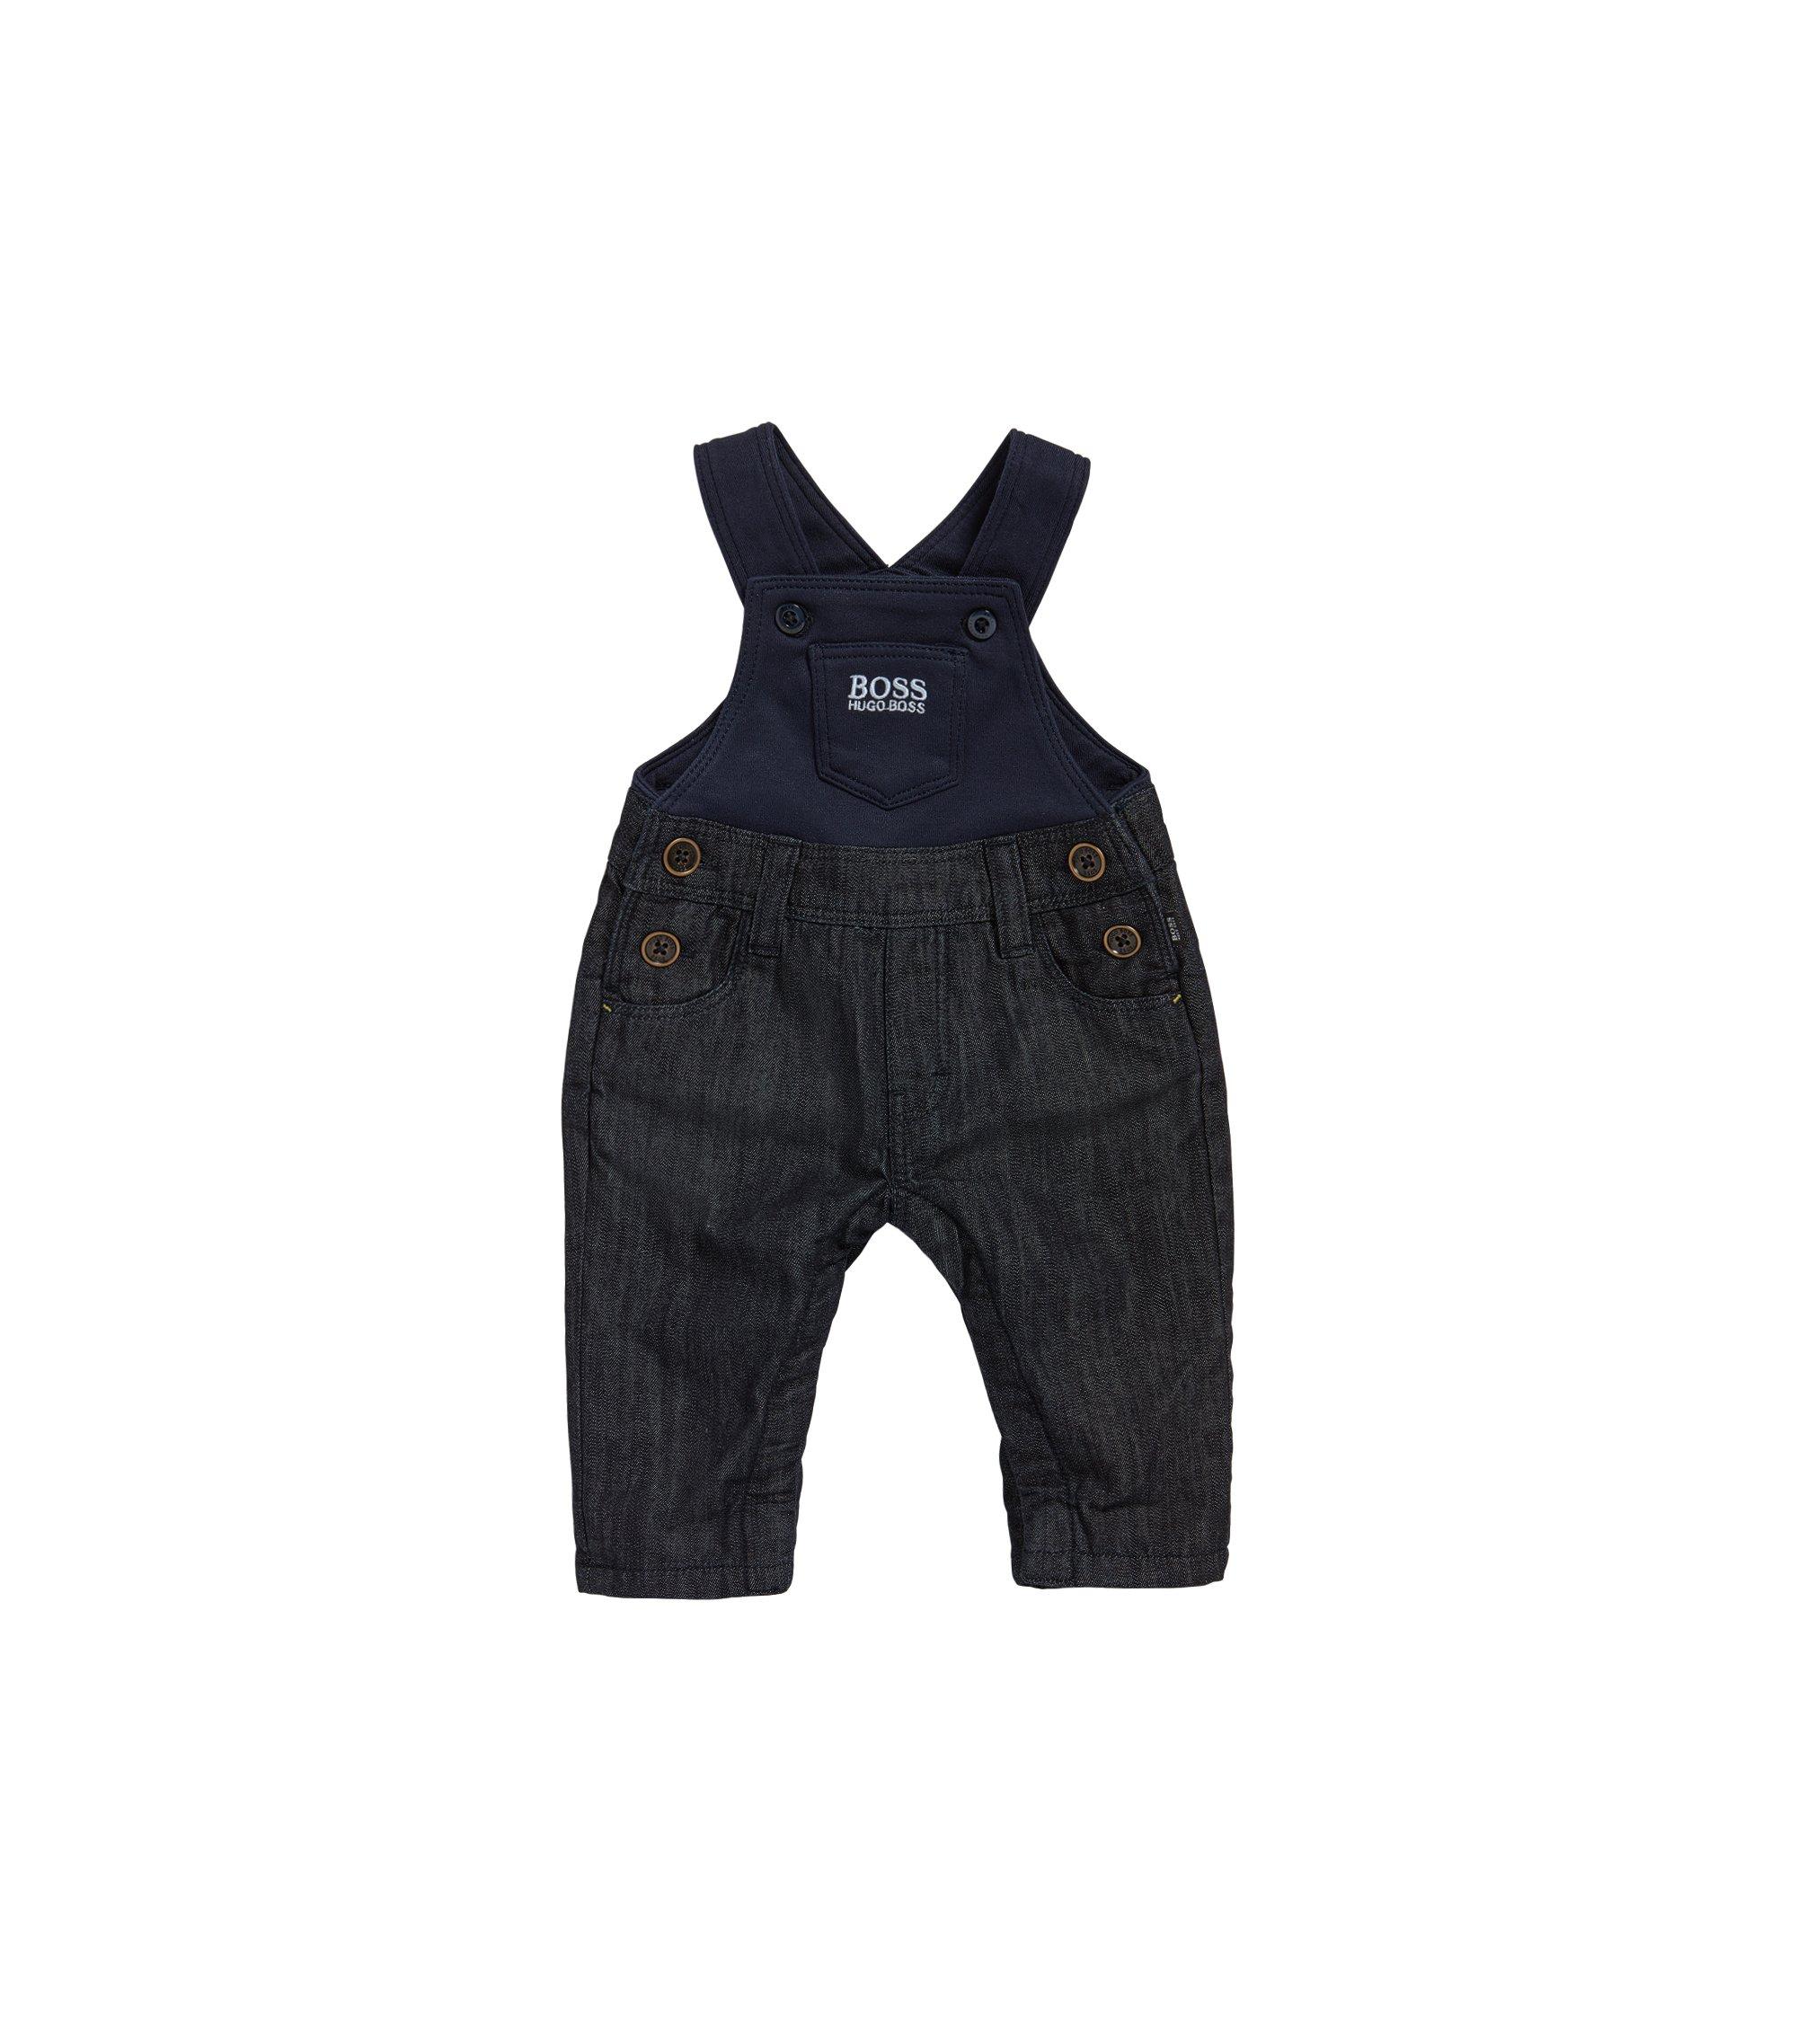 Baby-Latzhose aus Baumwolle in Denim-Optik: 'J94168', Gemustert